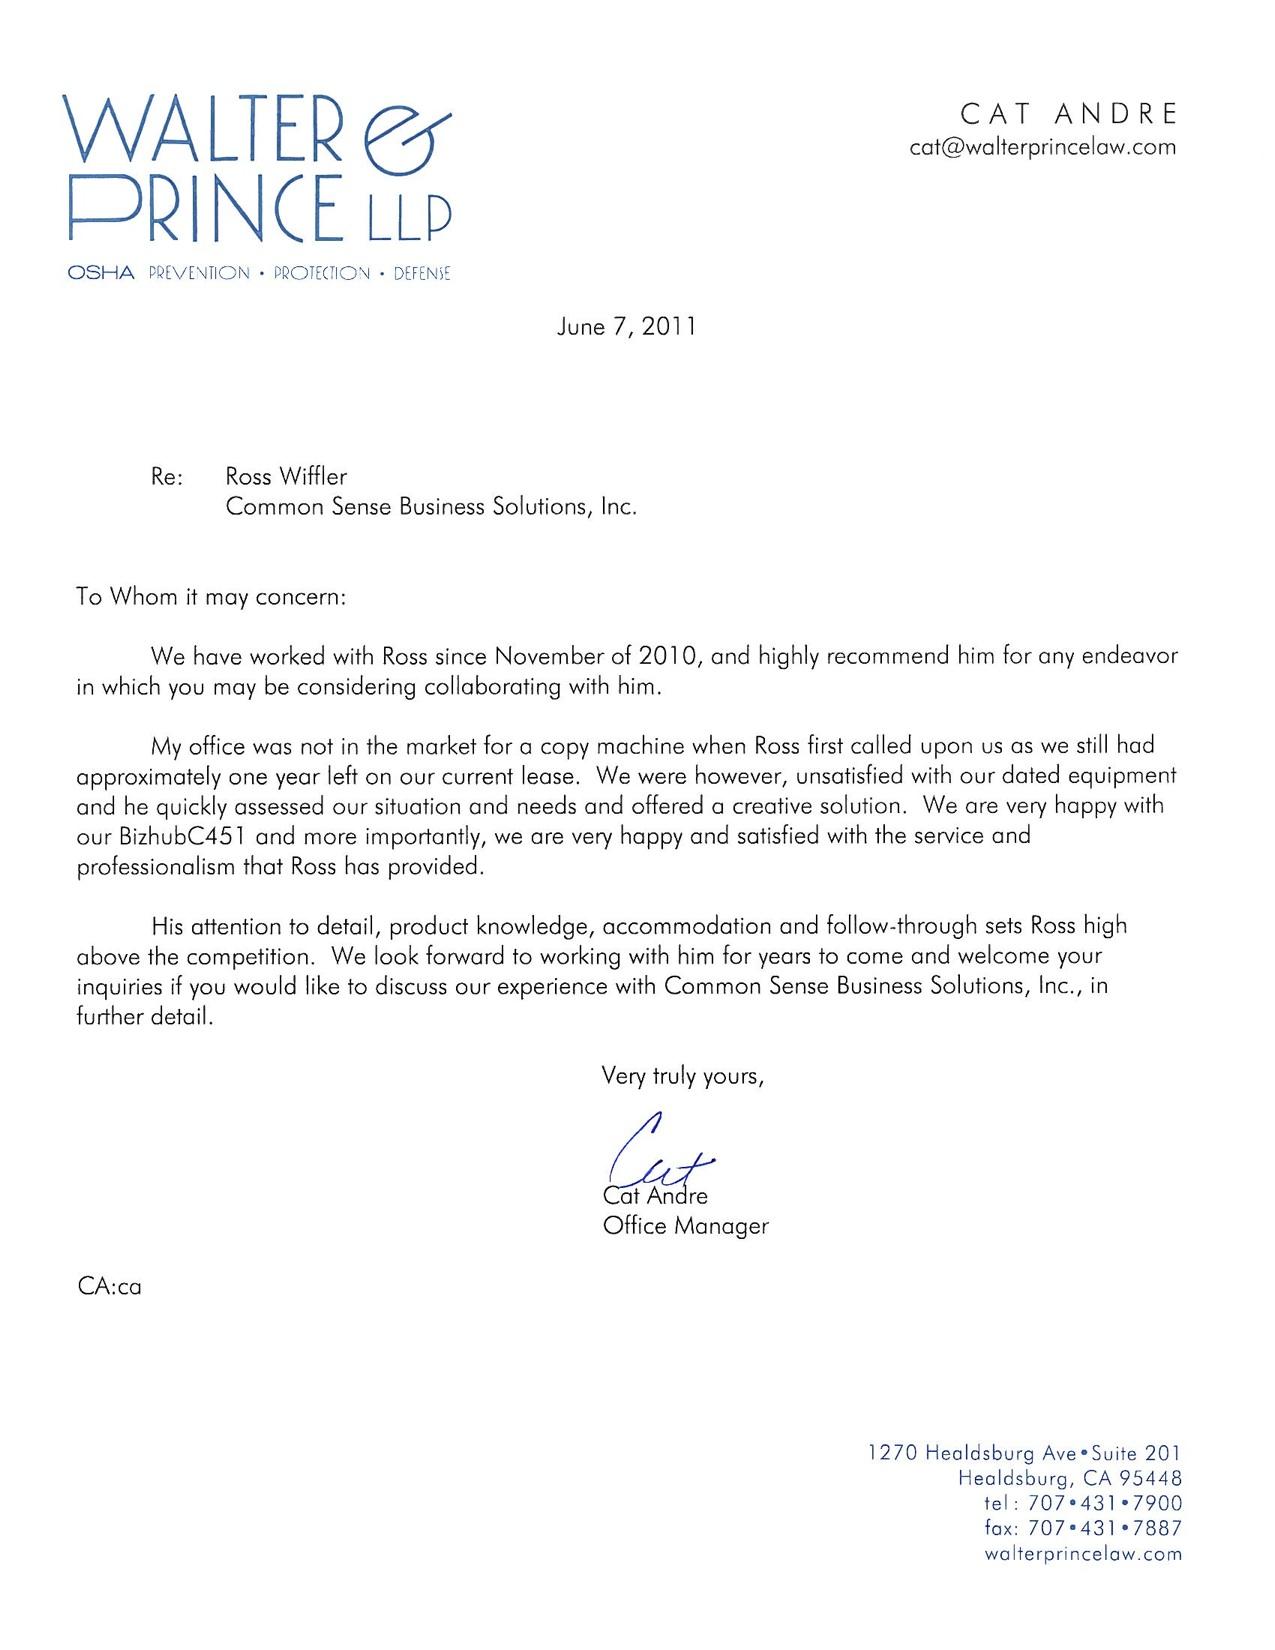 walter prince testimonial letter